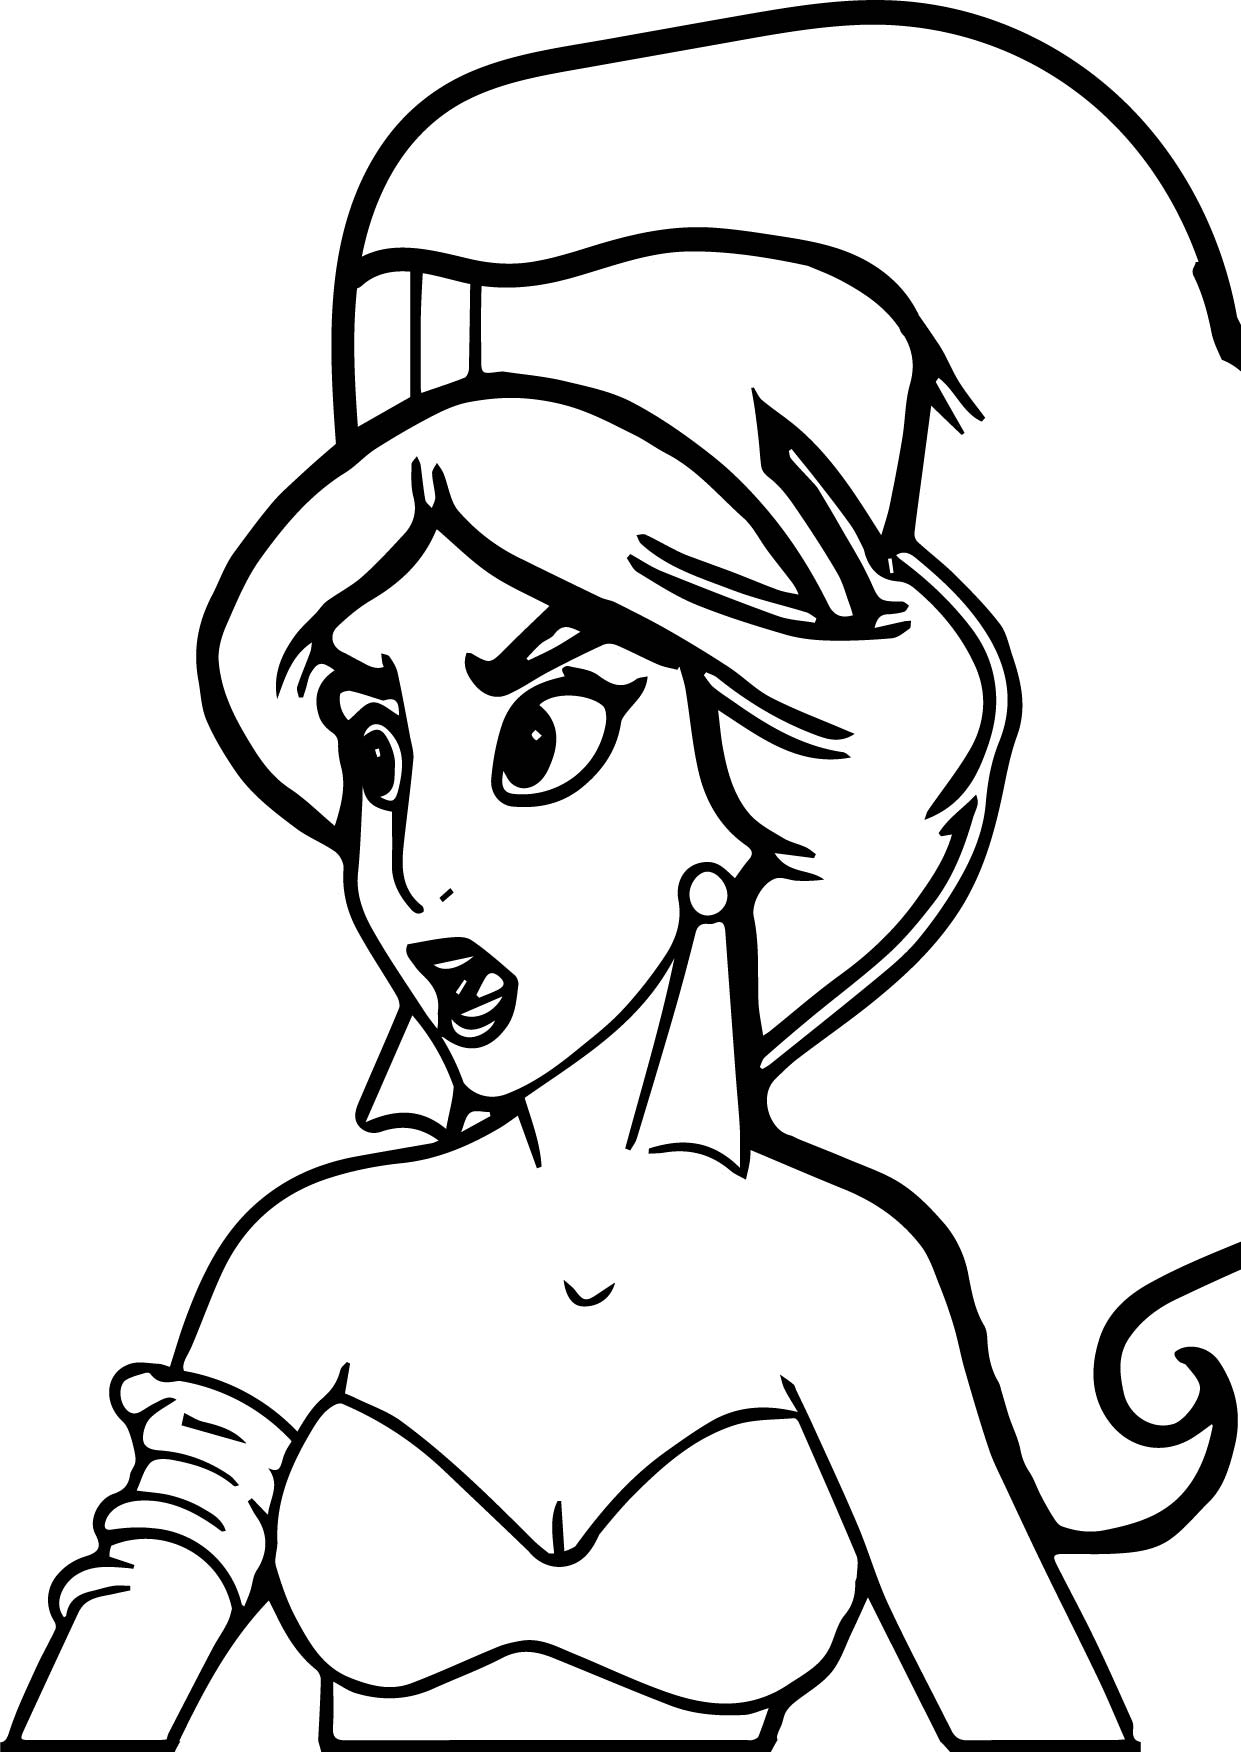 Princess Jasmine From Aladdin Movie Coloring Page Wecoloringpage